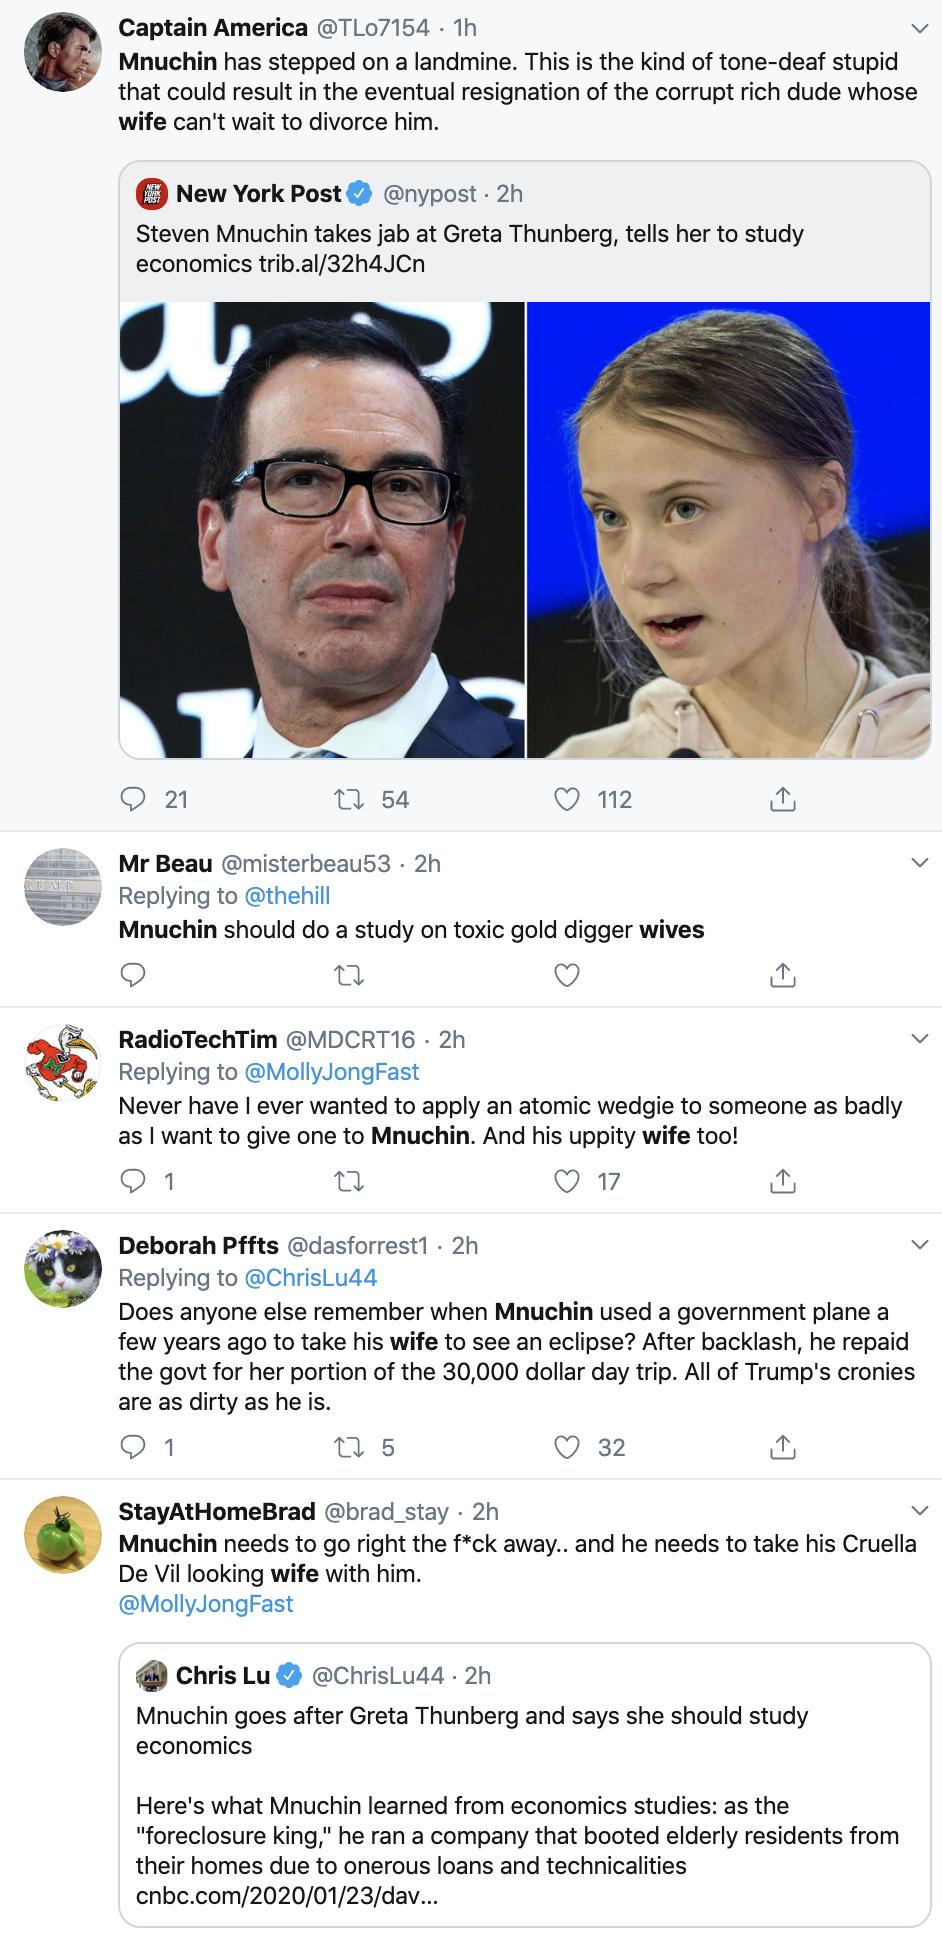 Screen-Shot-2020-01-23-at-8.55.34-AM Trump Admin Attacks Greta Thunberg's Intelligence Economy Environment Featured Top Stories